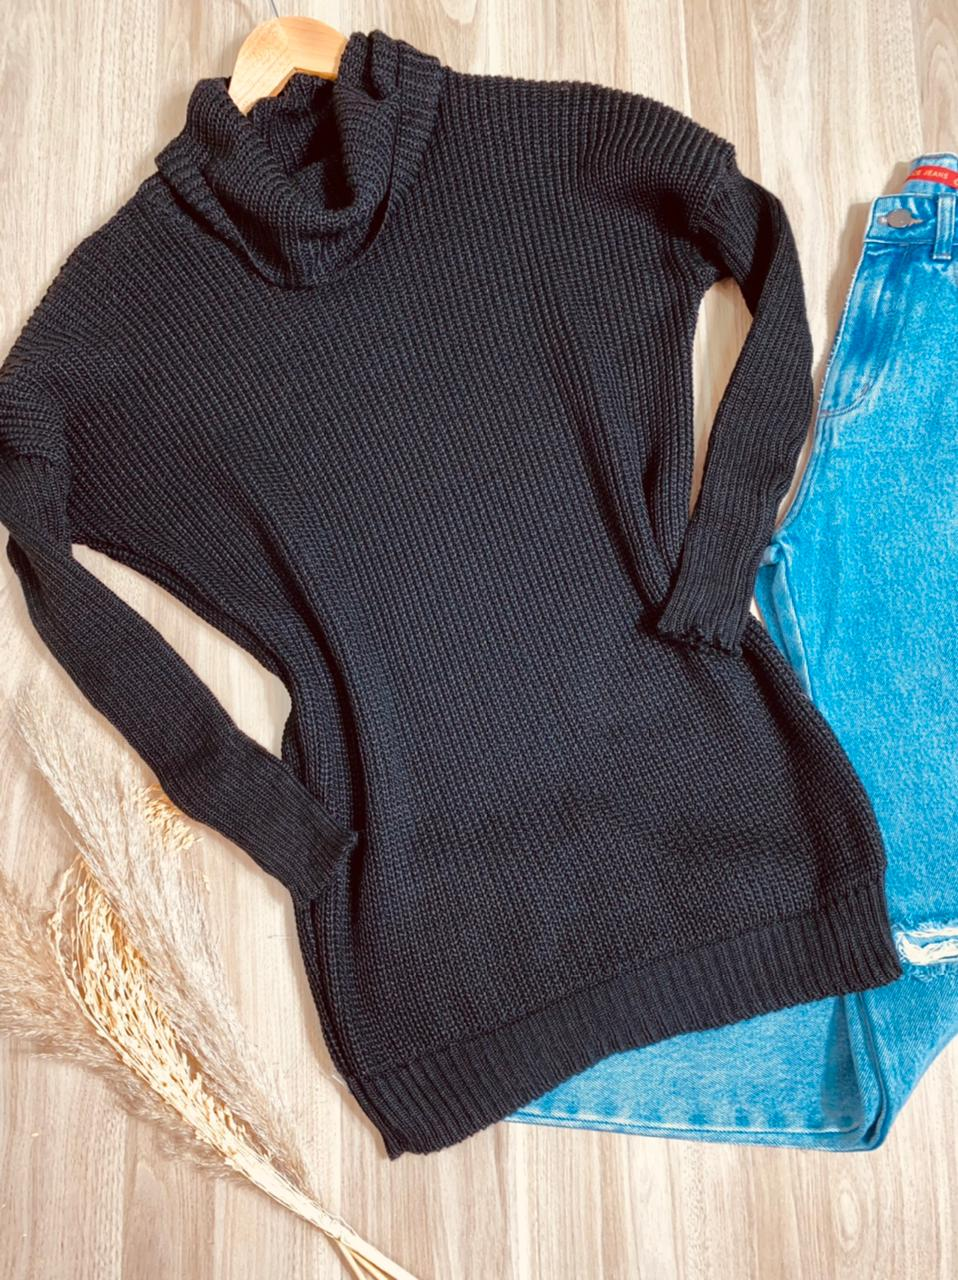 Blusa Tricot Gola Alta Luciana Fashion